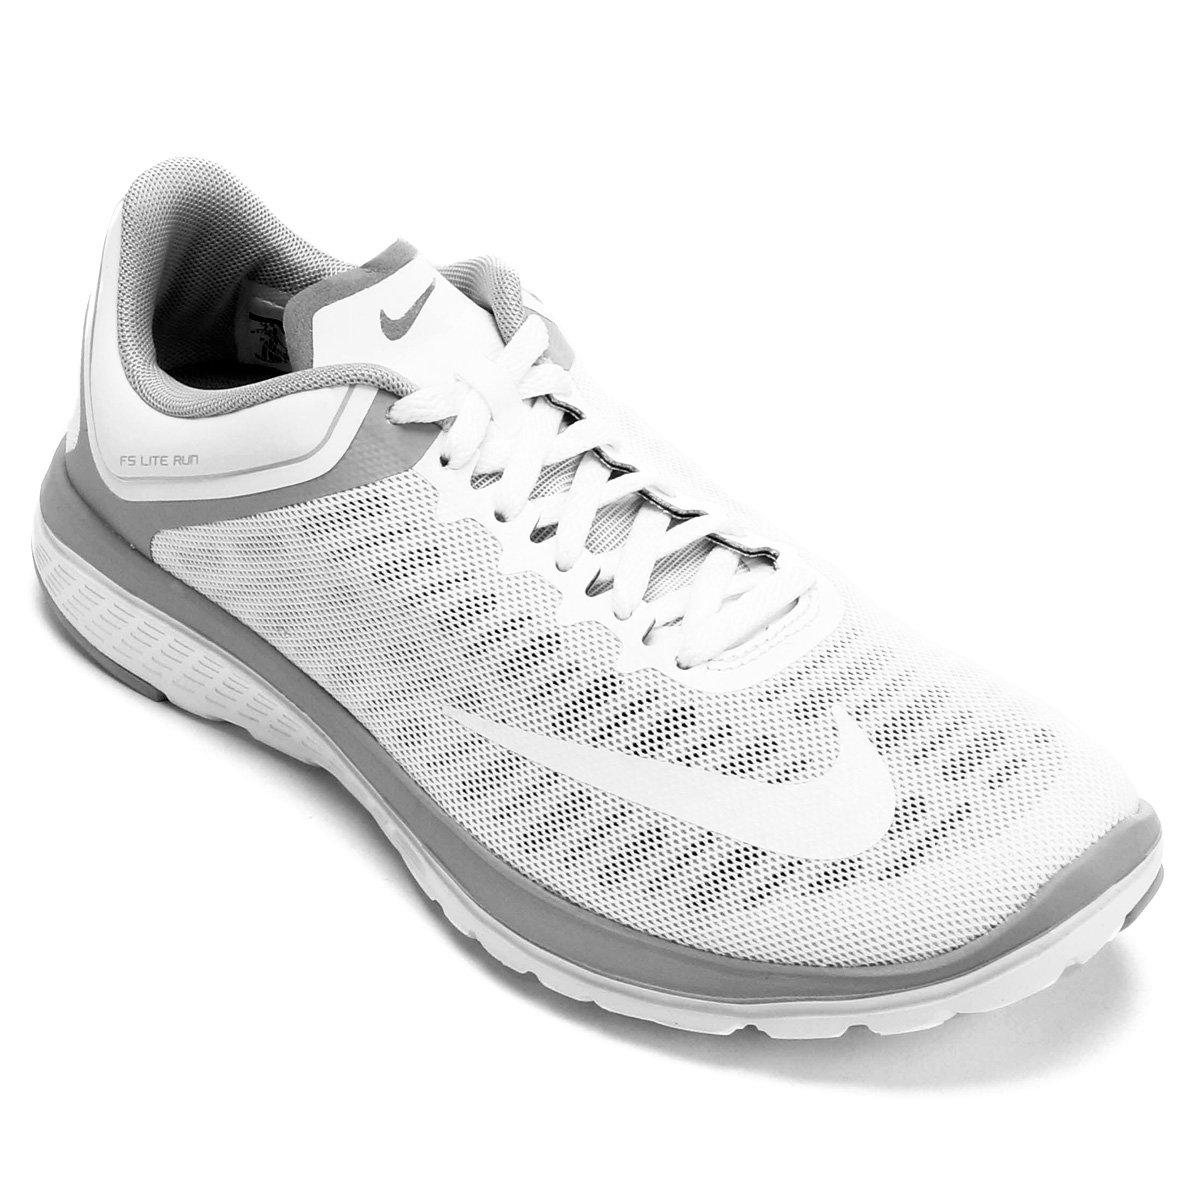 6f3f0e1cf1bad Tênis Nike Fs Lite Run 4 Feminino - Compre Agora